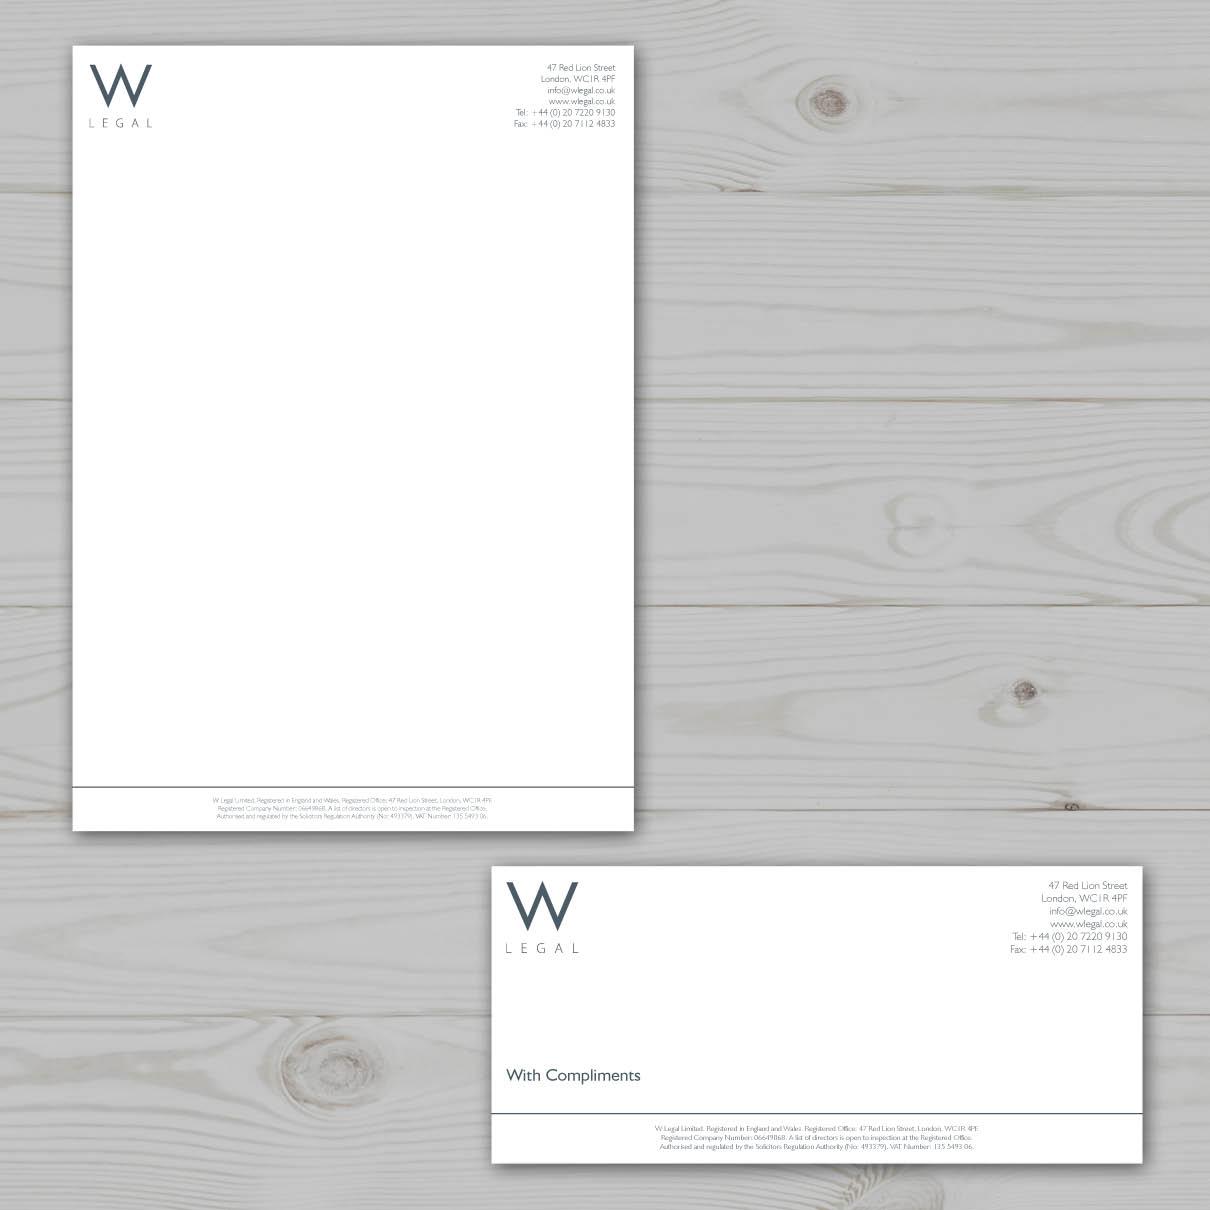 W-Legal-Letterhead-FLAT